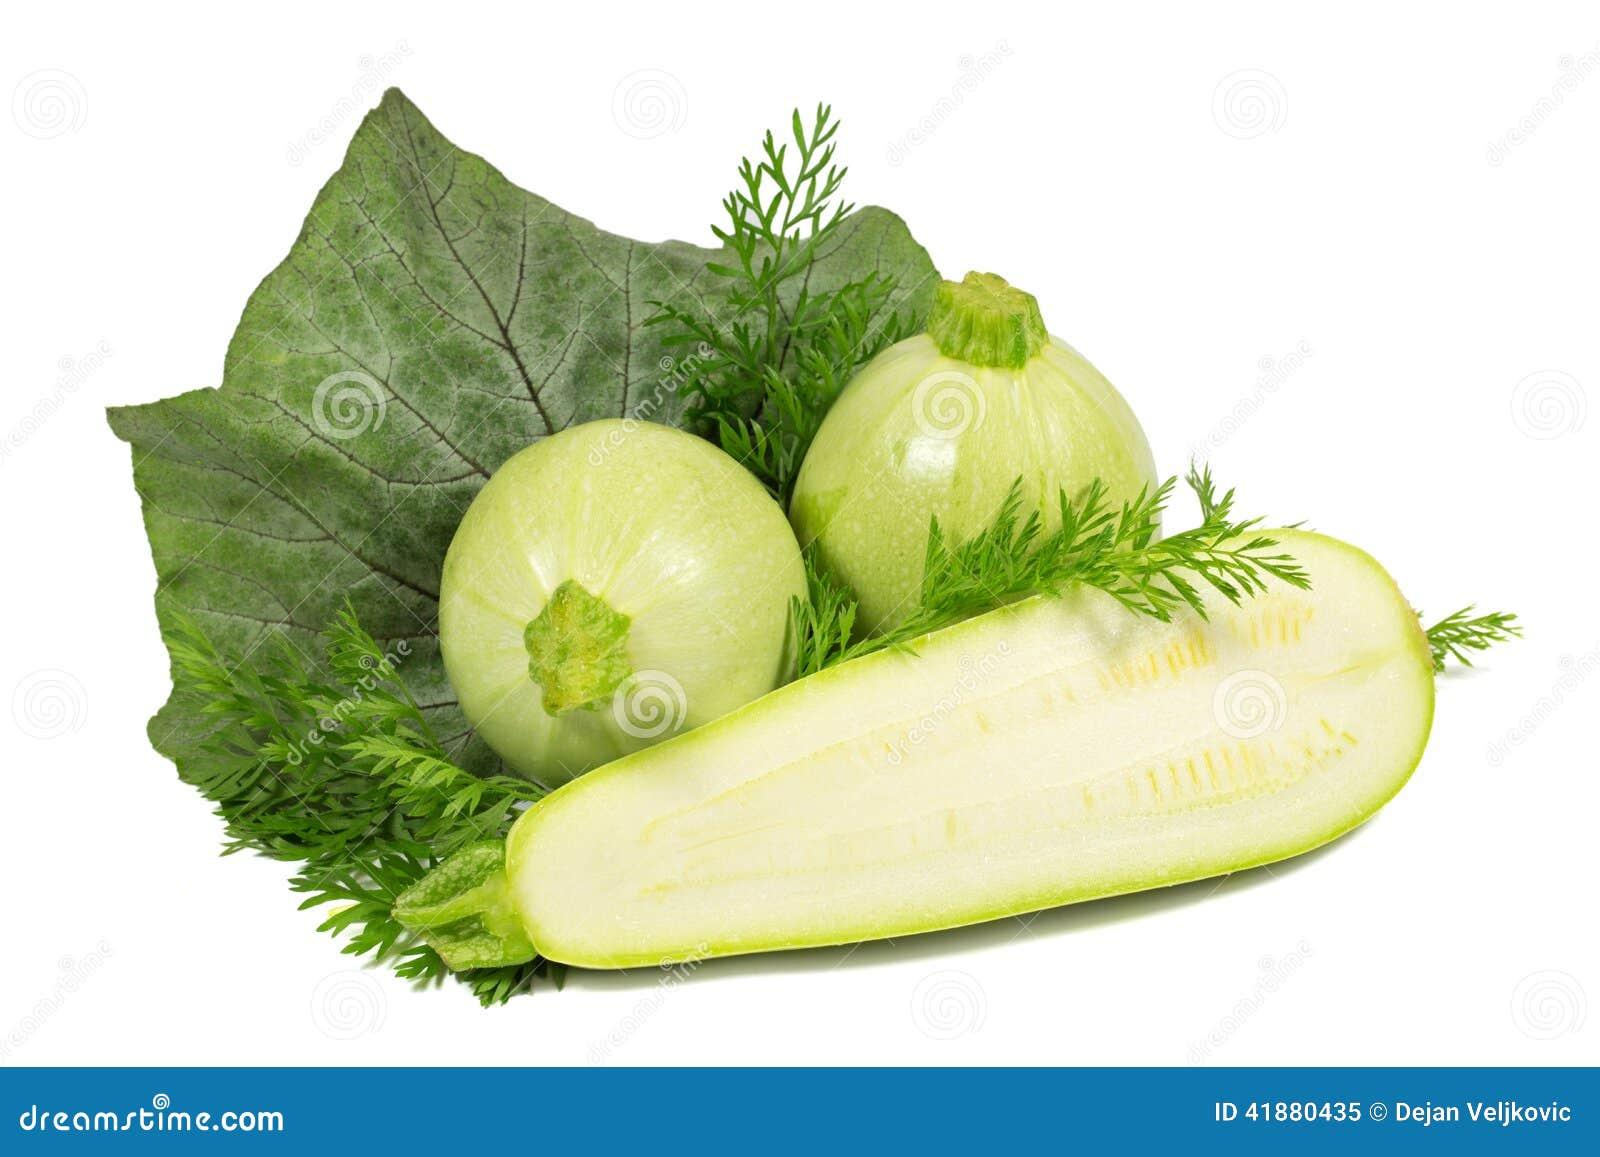 runde zucchini runde zucchini floridor f1 soul plants pflanzen f r runde zucchini satellite f1. Black Bedroom Furniture Sets. Home Design Ideas